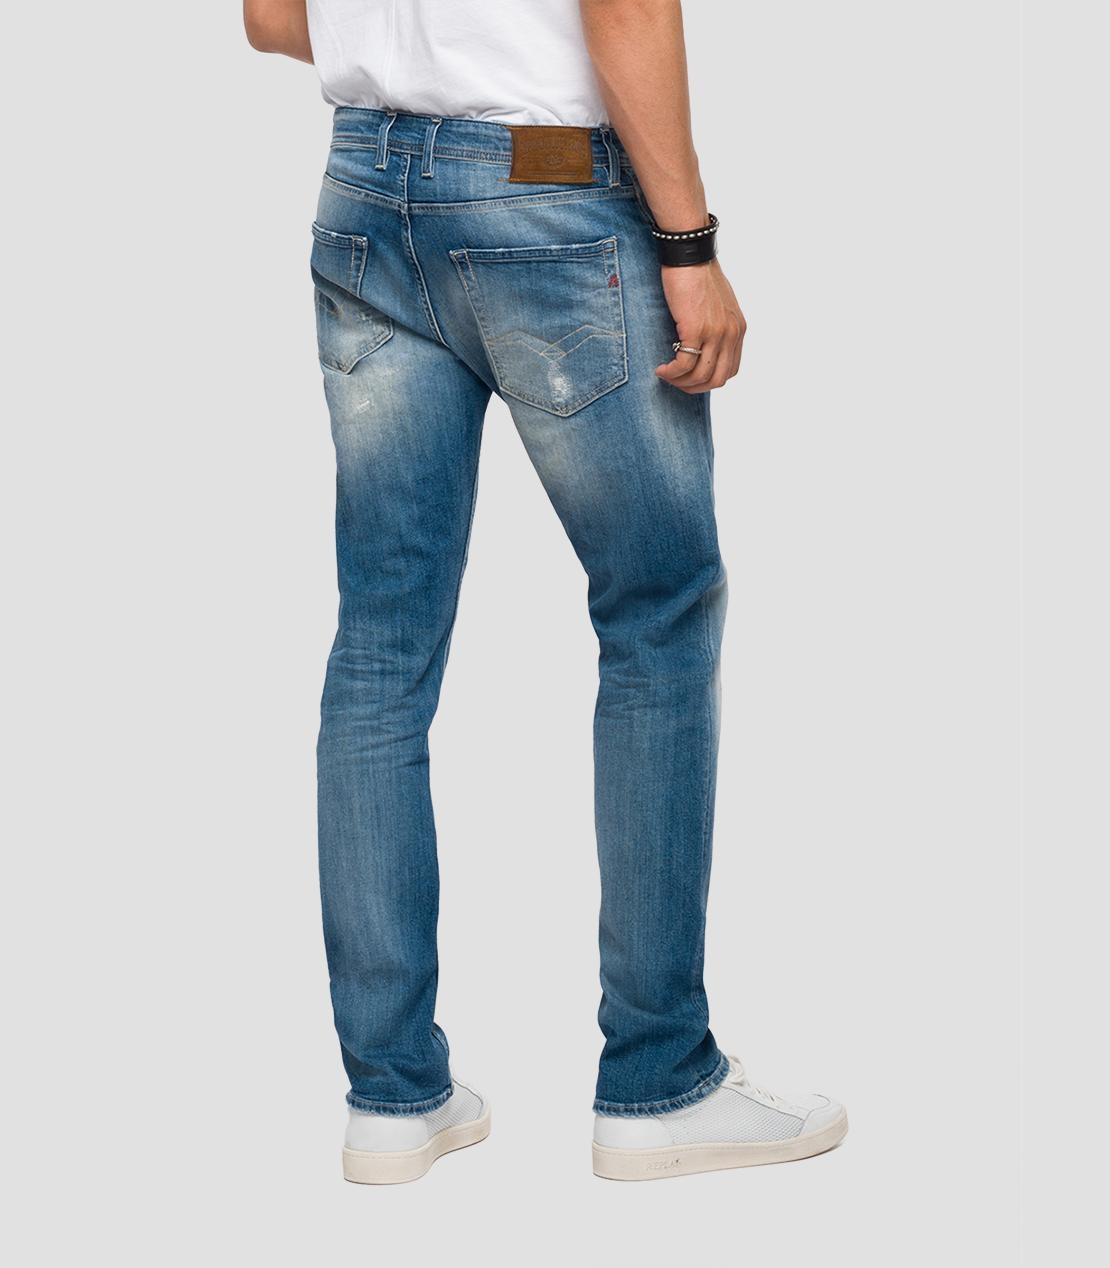 Pantalón tejano 10,5 oz REGULAR 972 GROVER color azul medio lavado. 98% Algodón 2% Elastano. - Ítem1